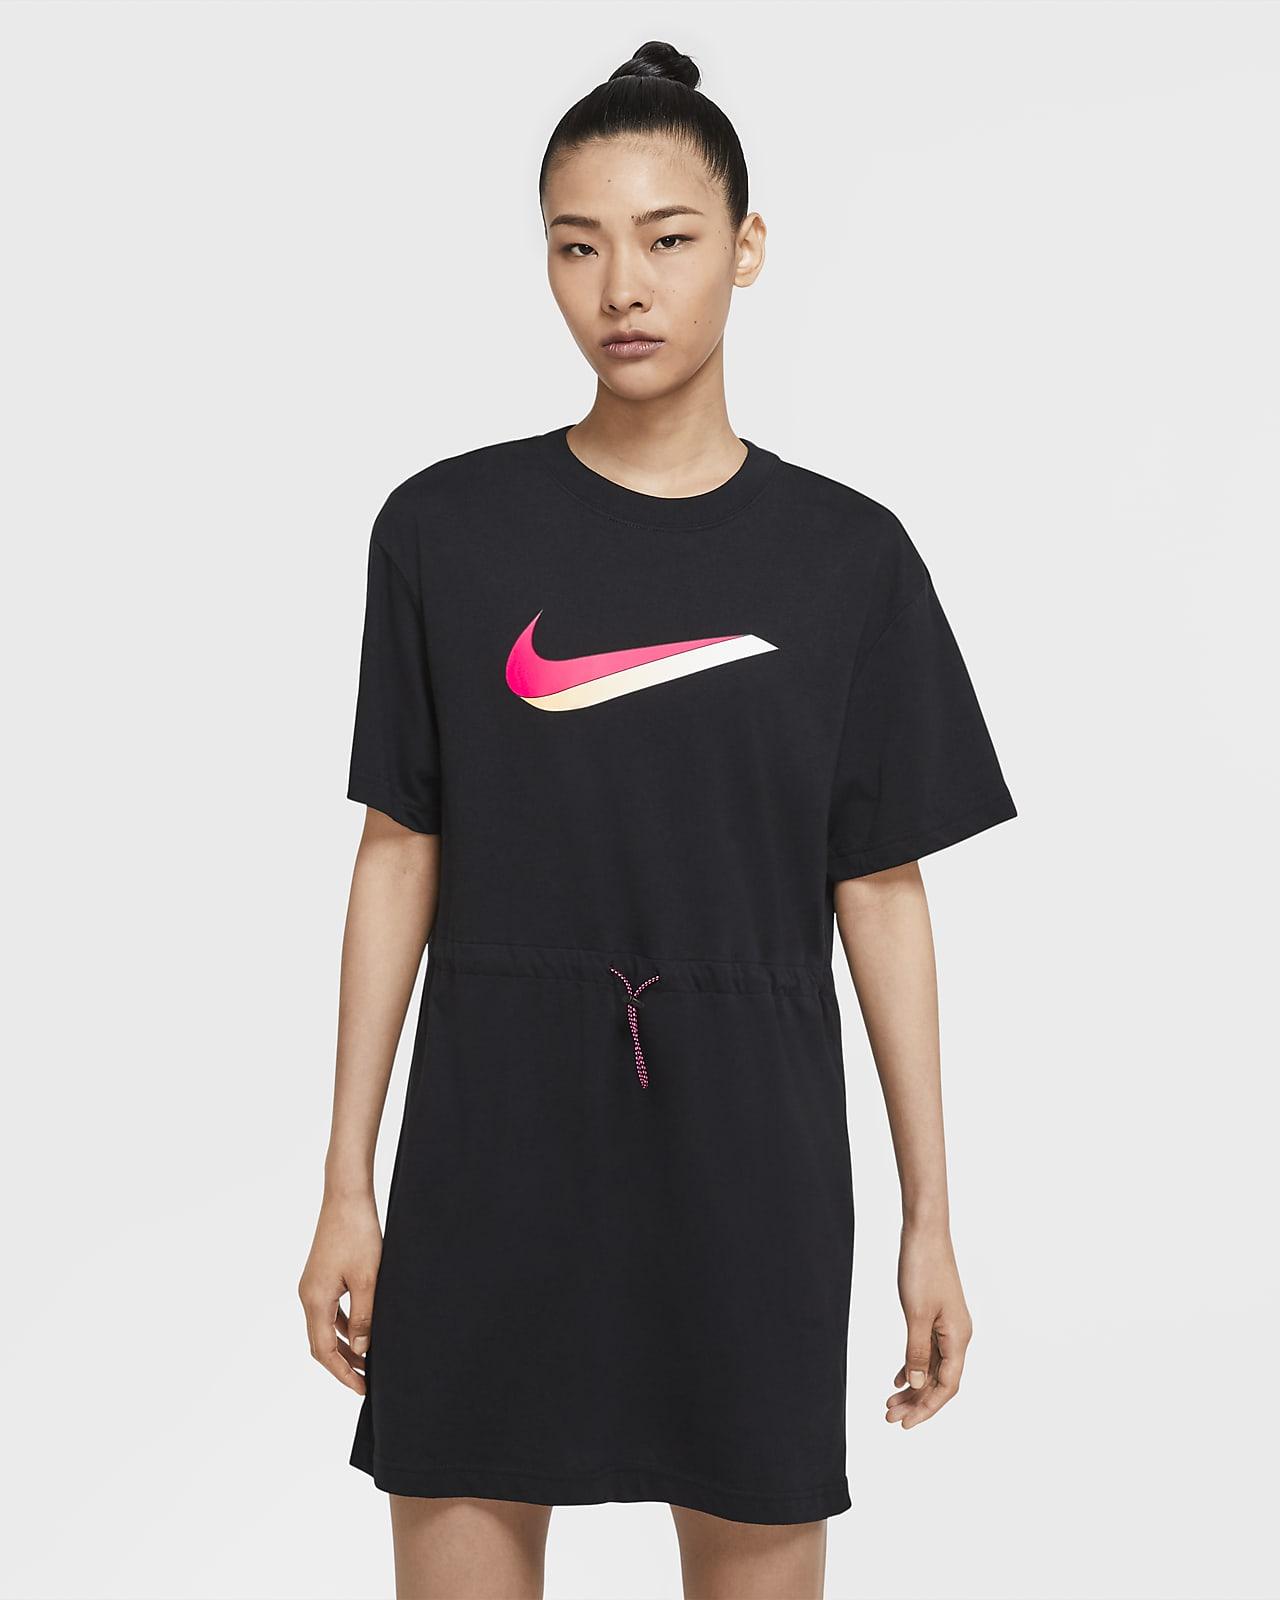 Robe à manches courtes Nike Sportswear pour Femme